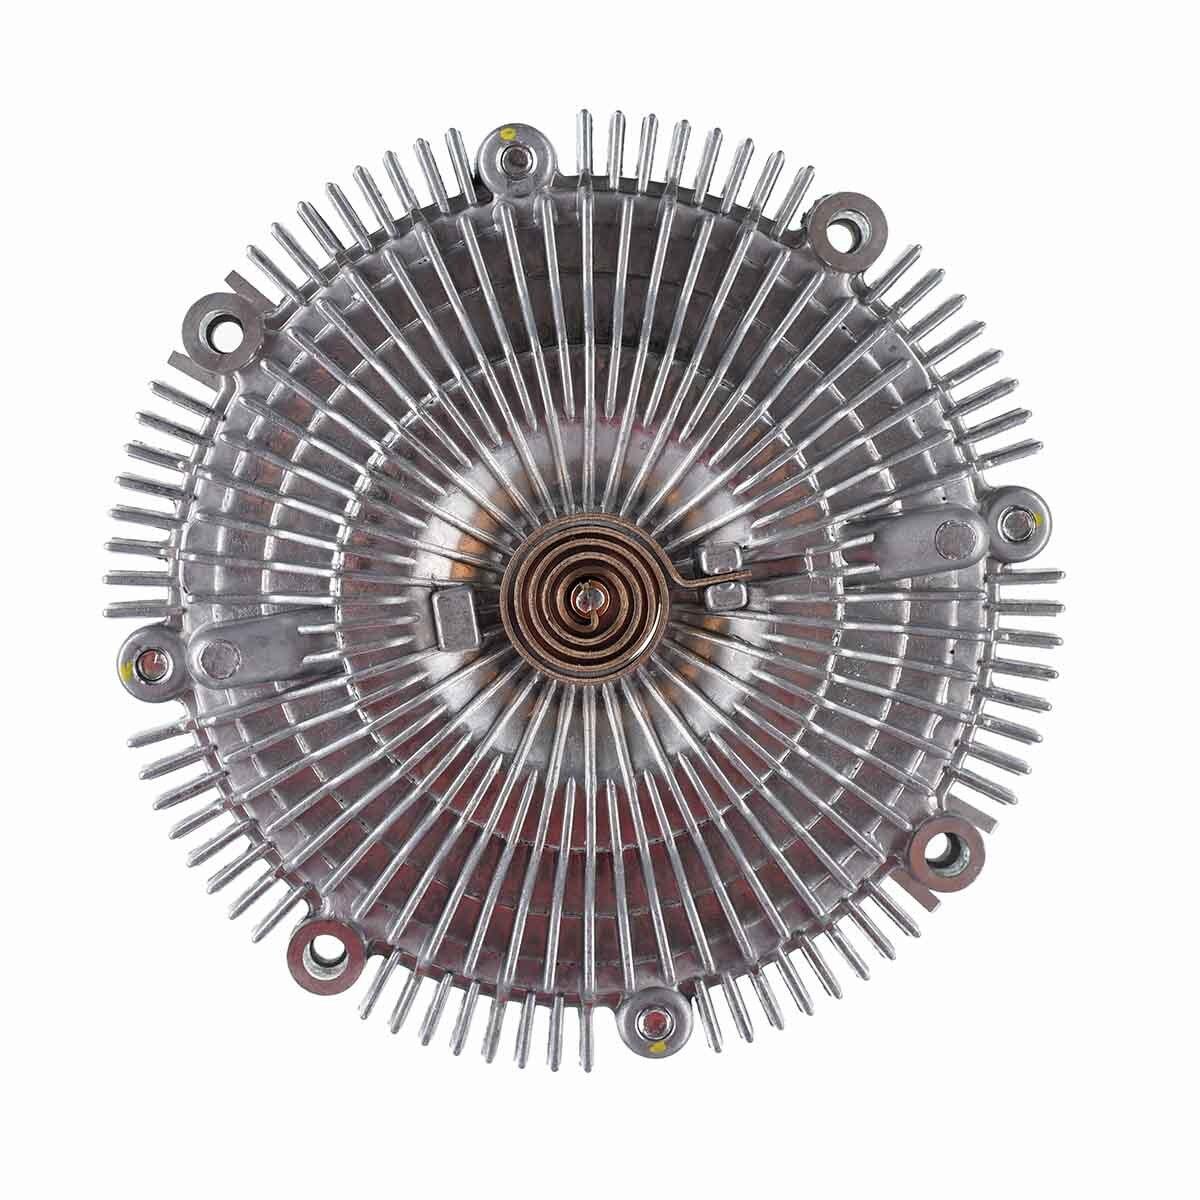 Cooling Fan Clutch for Nissan 300ZX D21 Frontier Pathfinder Pickup Xterra Infiniti Q45 QX4 210820W000 2664